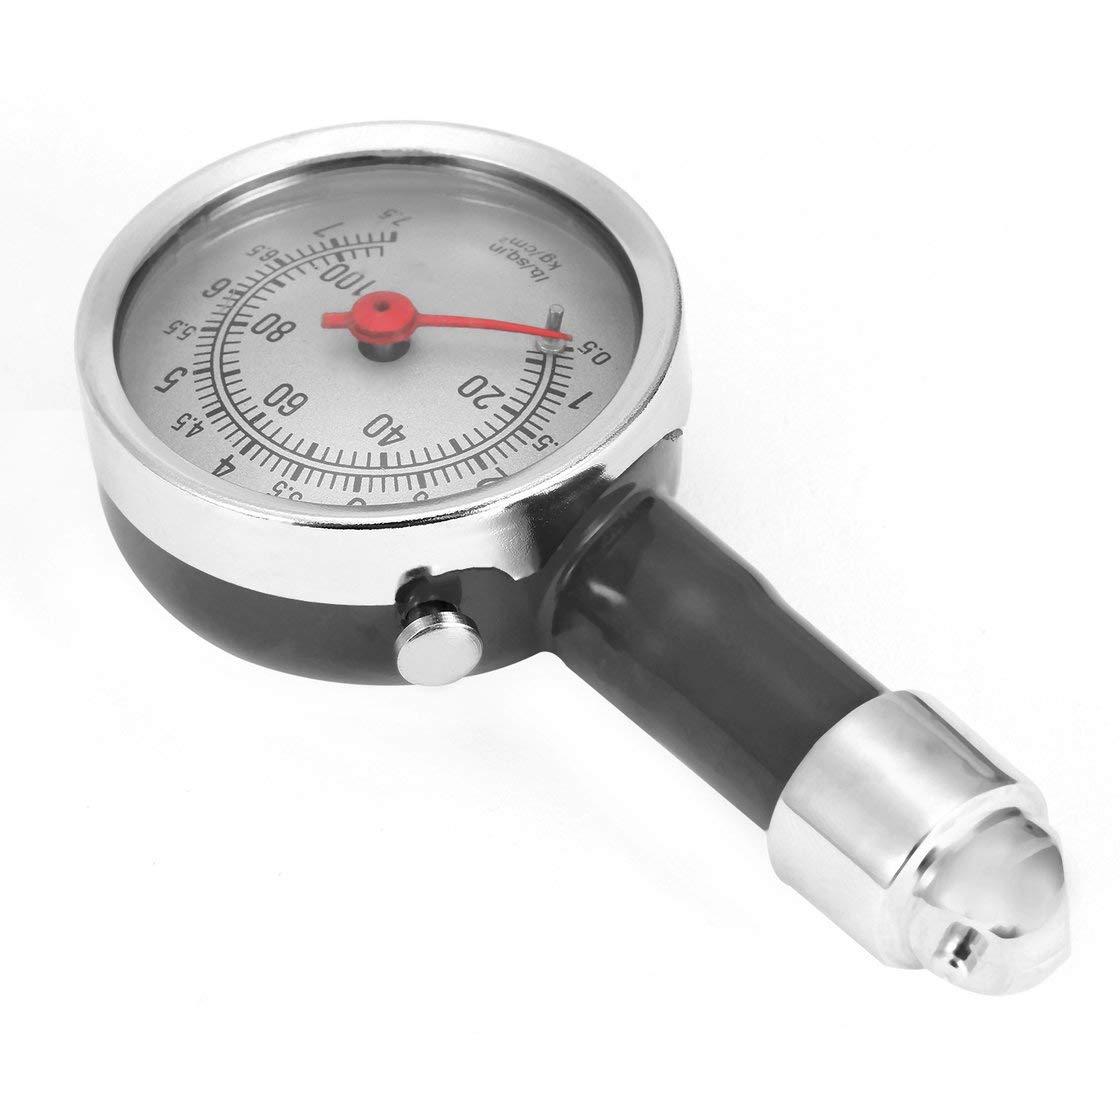 Hermosairis Schwarz Hohe Prä zision Auto Motor Bike Dial Reifen Mini Reifendruckprü fer Meter Mess Fetal Pressure Monitor Tools